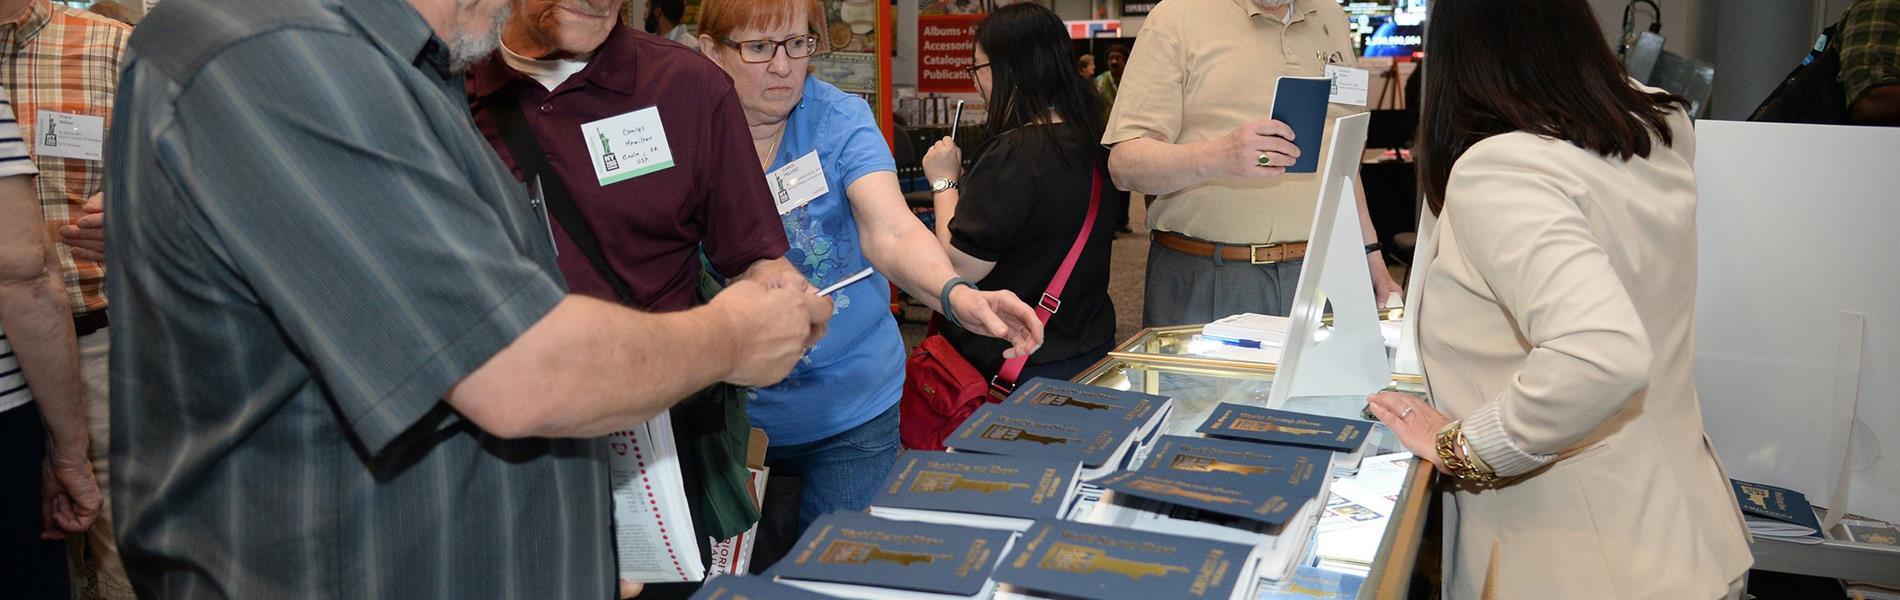 linns-scott-booth-philatelic-passport